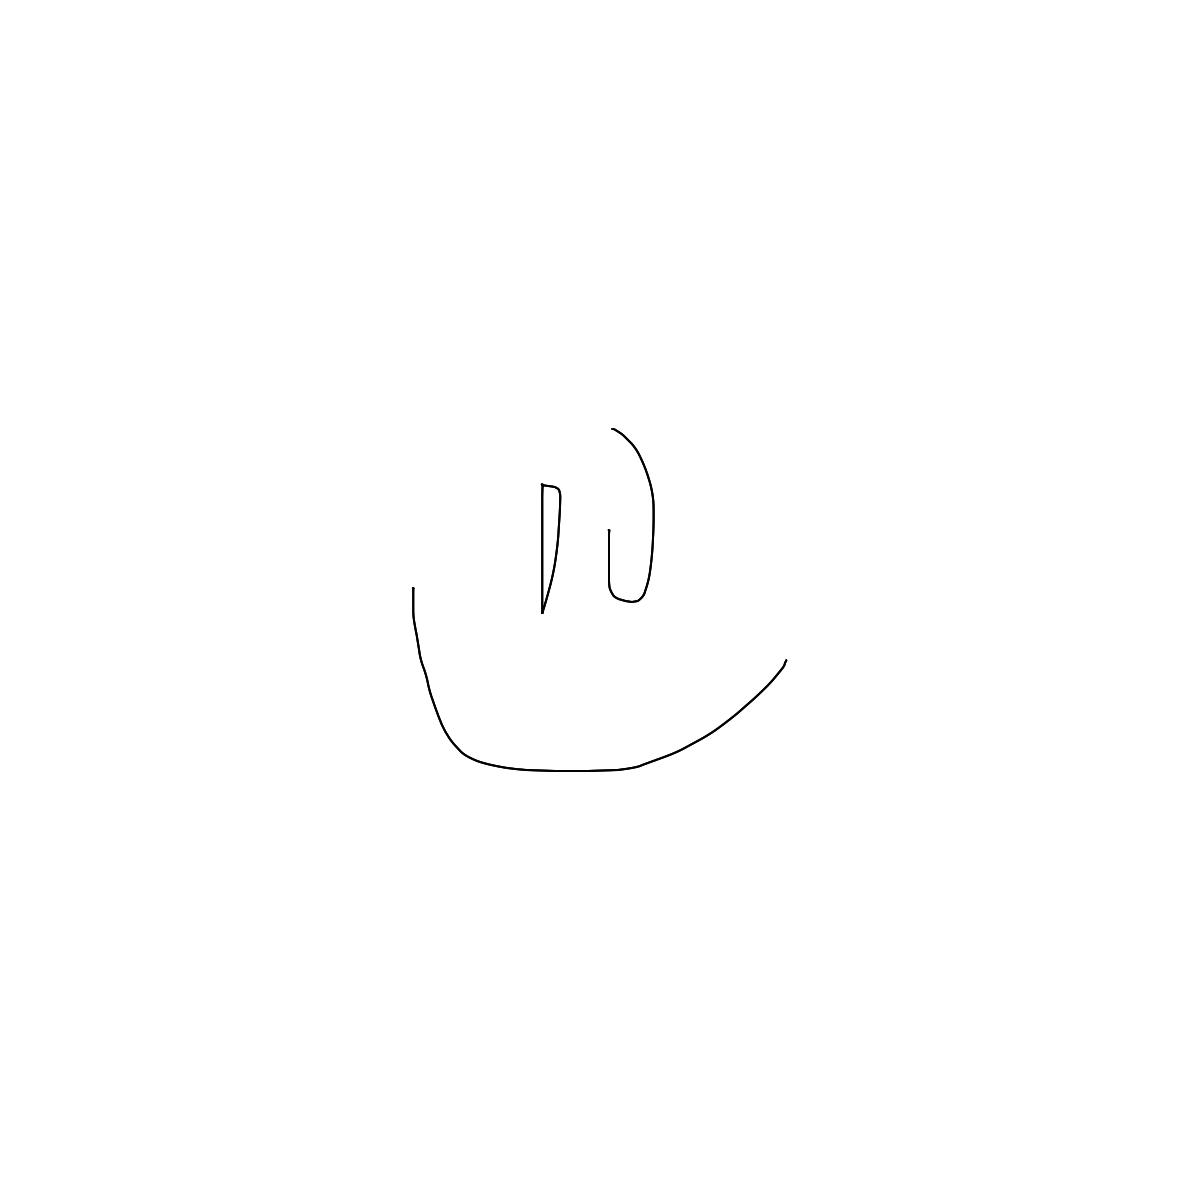 BAAAM drawing#16549 lat:32.9992752075195300lng: -96.7087402343750000